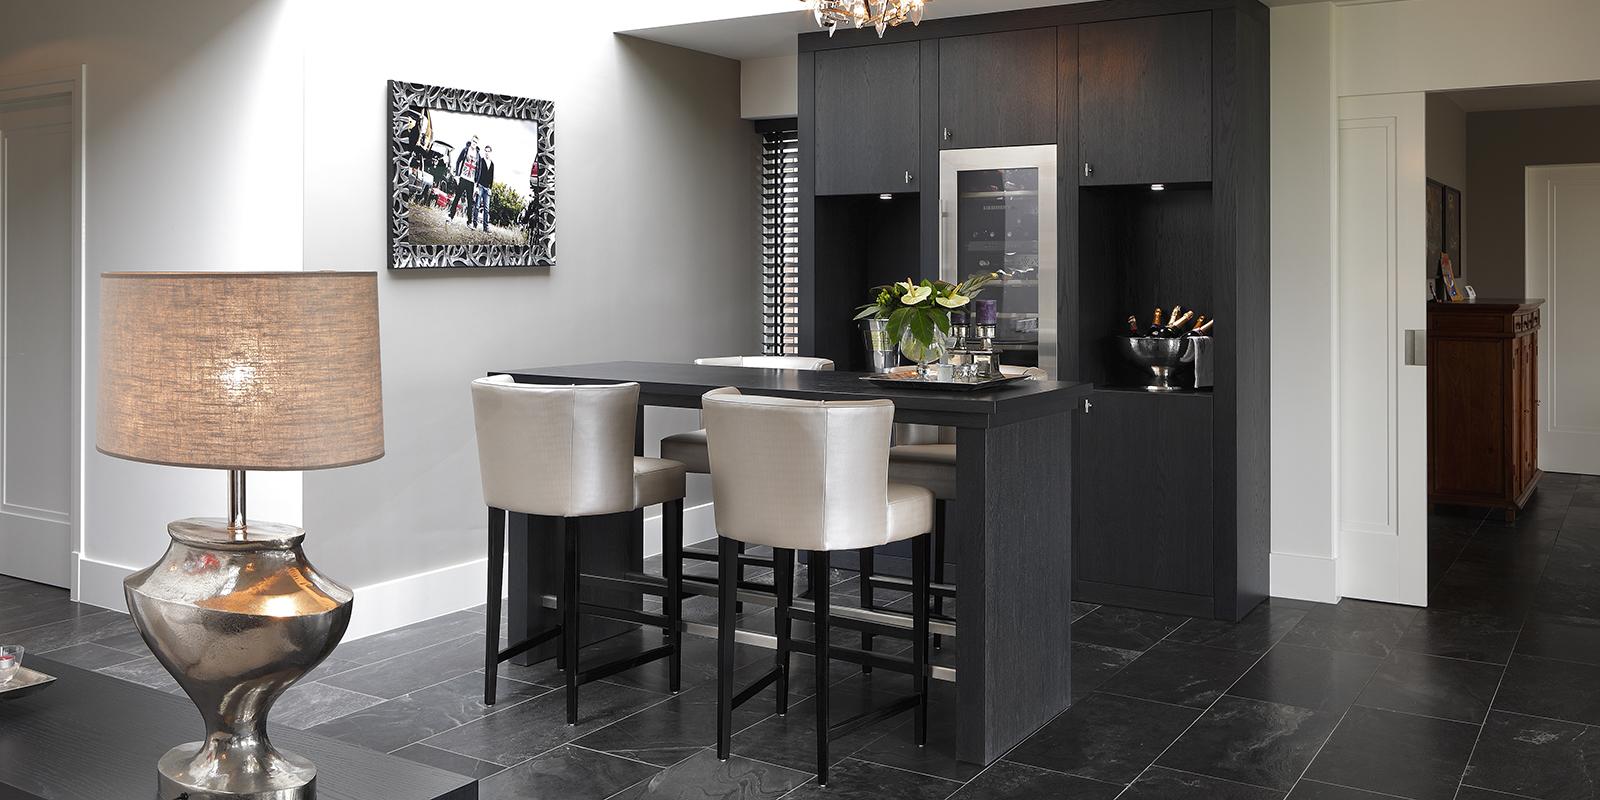 The Art of Living, Exclusief wonen, Interieurbouw Vos Interieur & Stijl, modern interieur, design, bar, villa, luxe, Koek Verlichting, tegelvloer, shutters, zwart